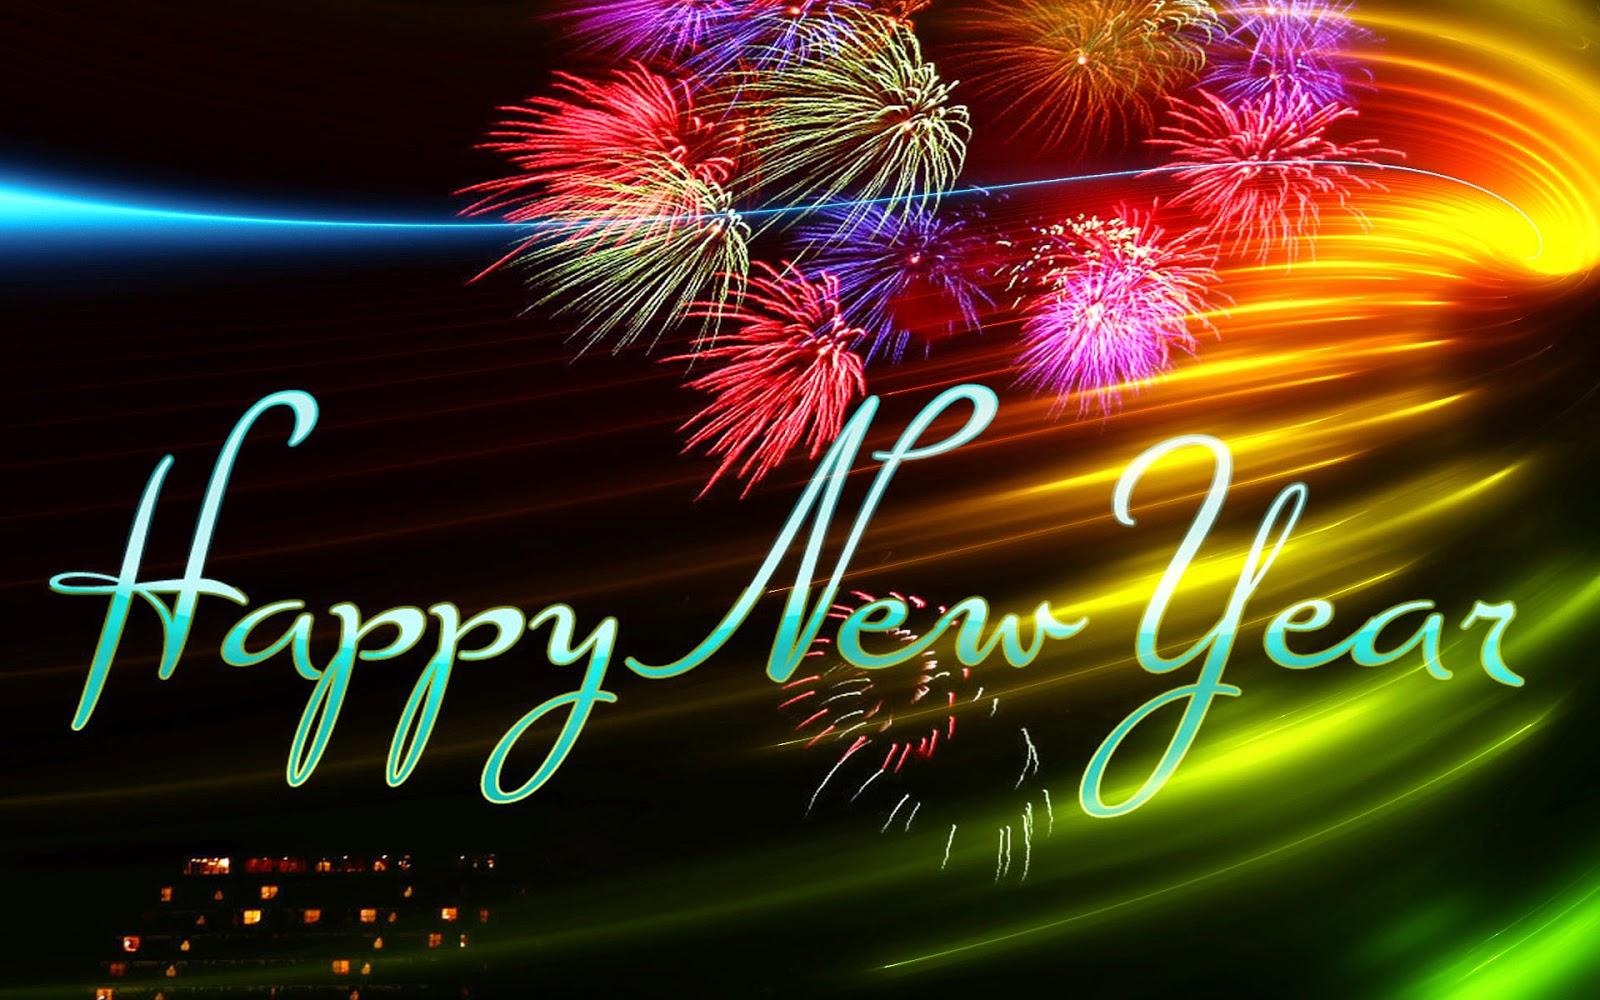 Happy New Year Wallpaper 2016 wallpaper download Happy New Year 2016 1600x1000